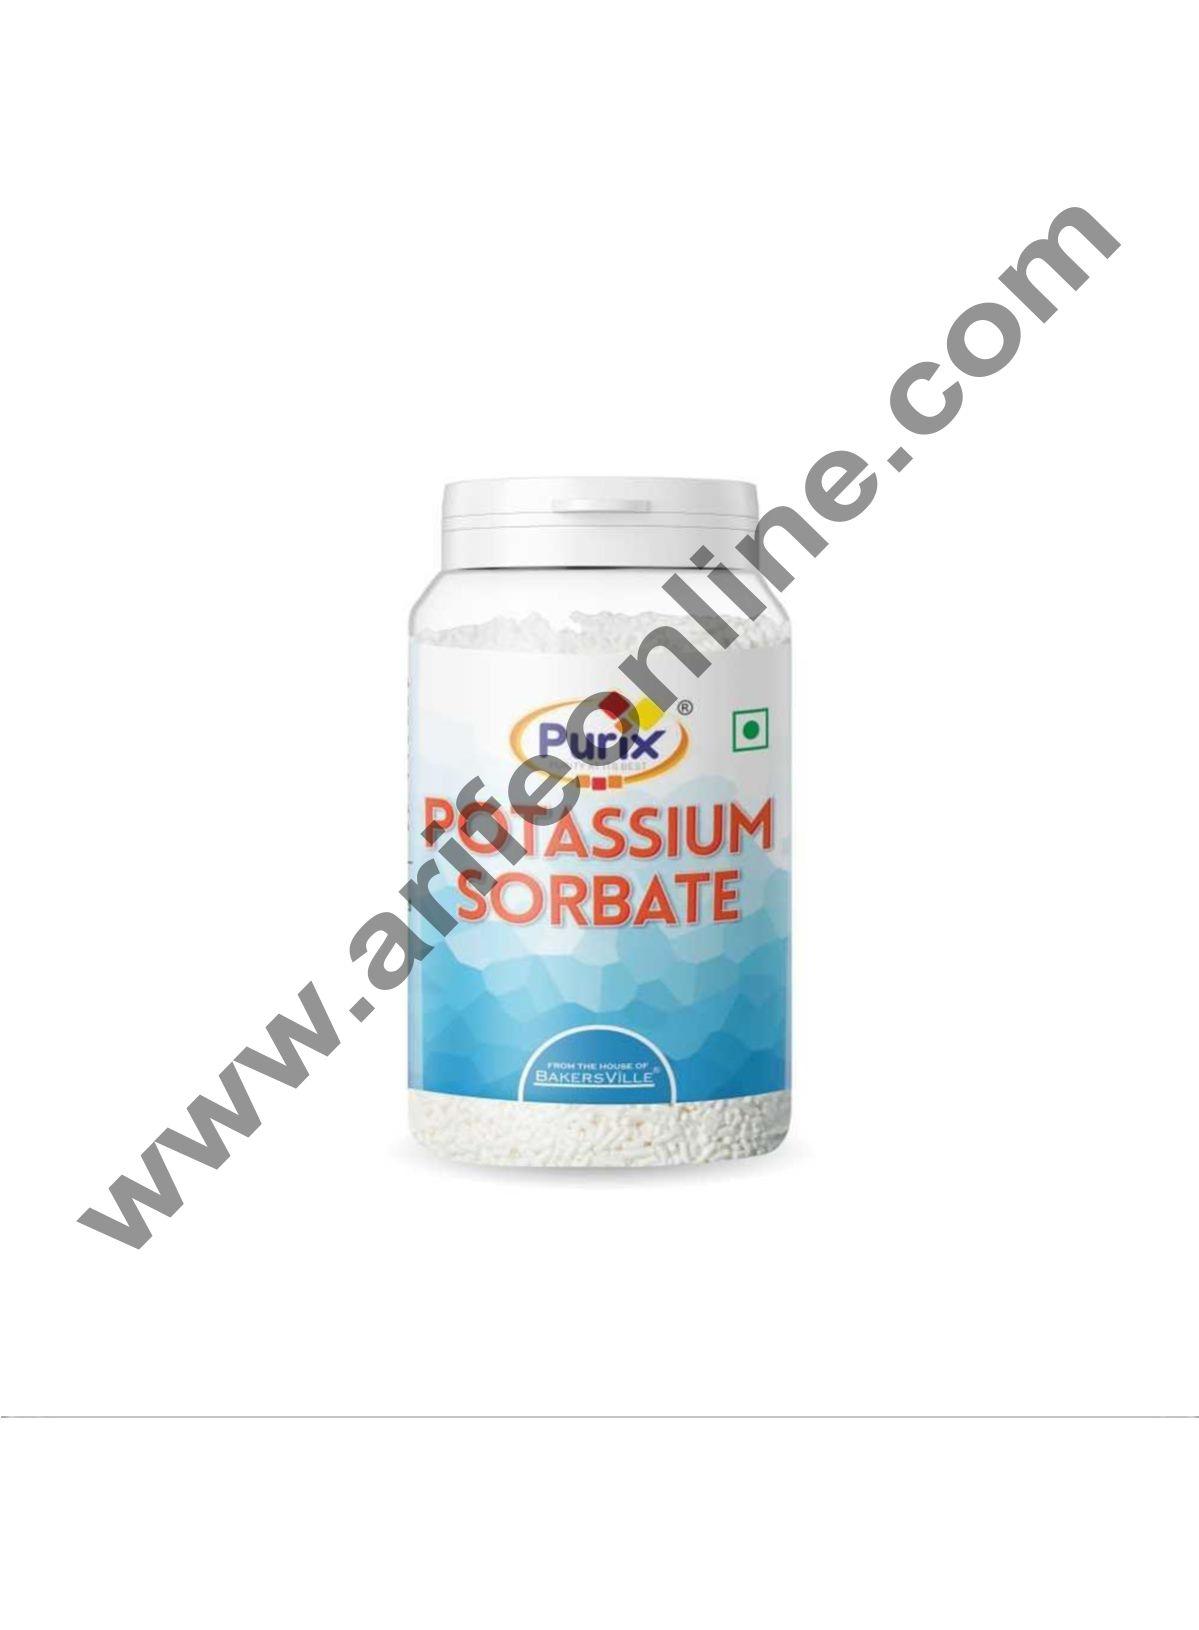 Purix™ Potassium Sorbate, 75gm